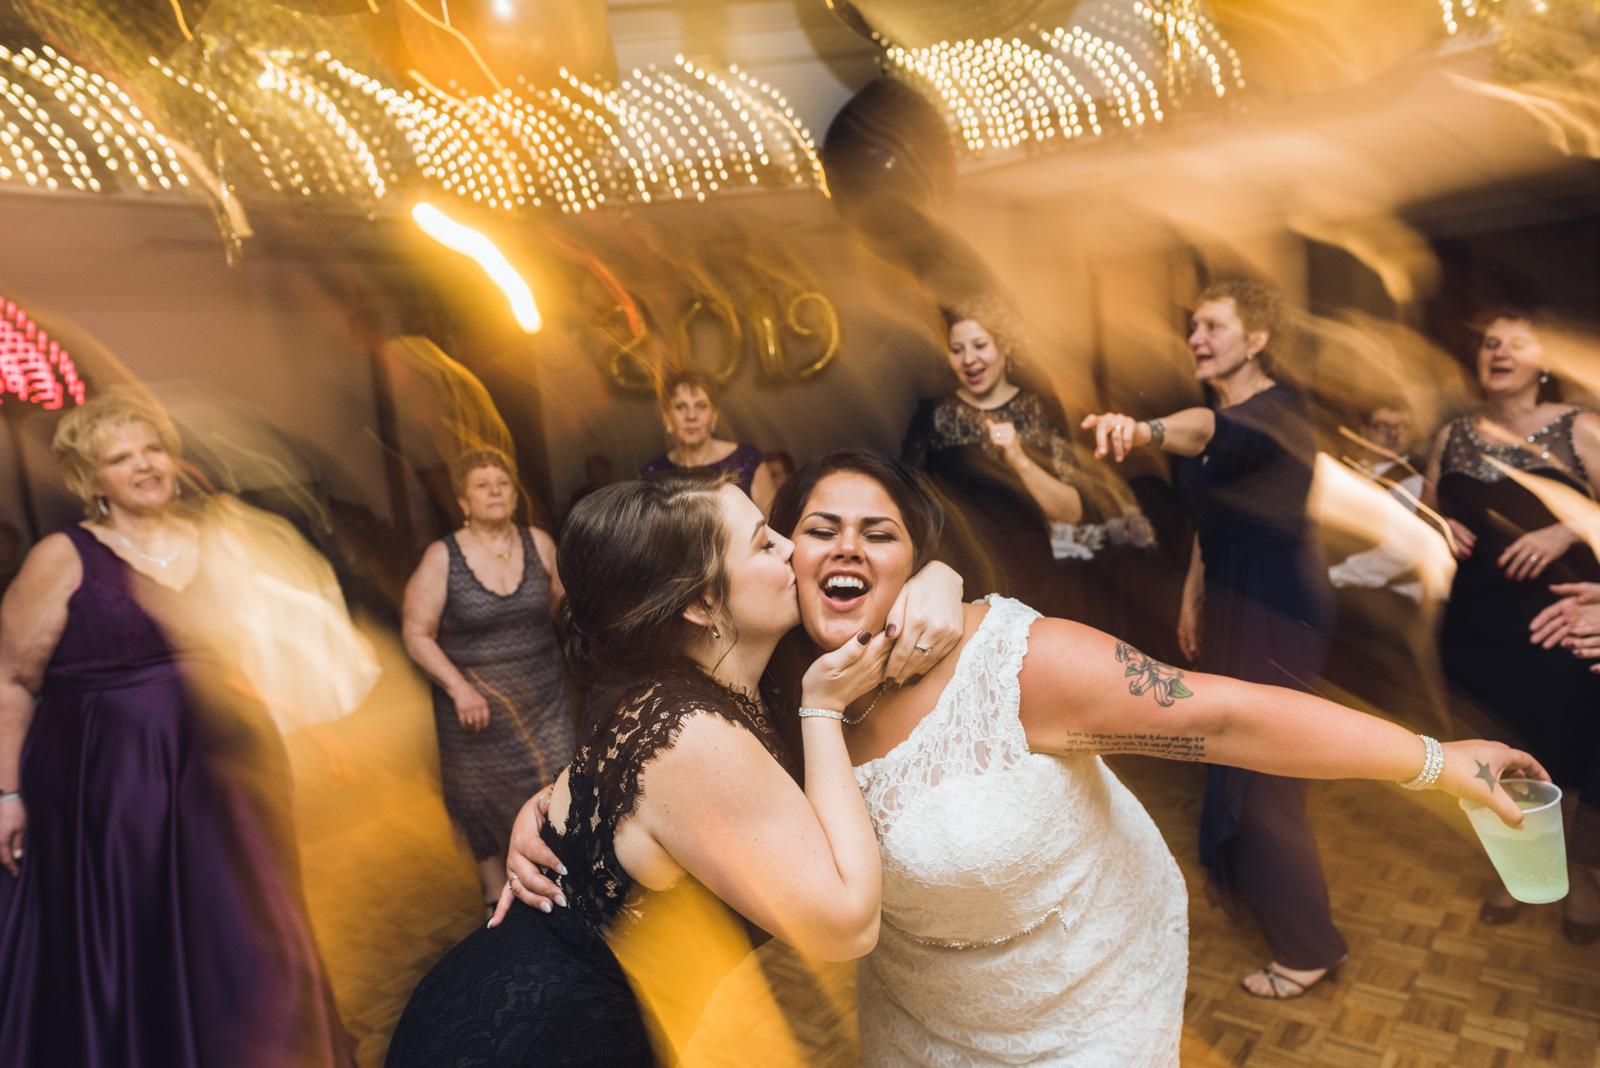 rheana-chris-wedding-blog-324.jpg